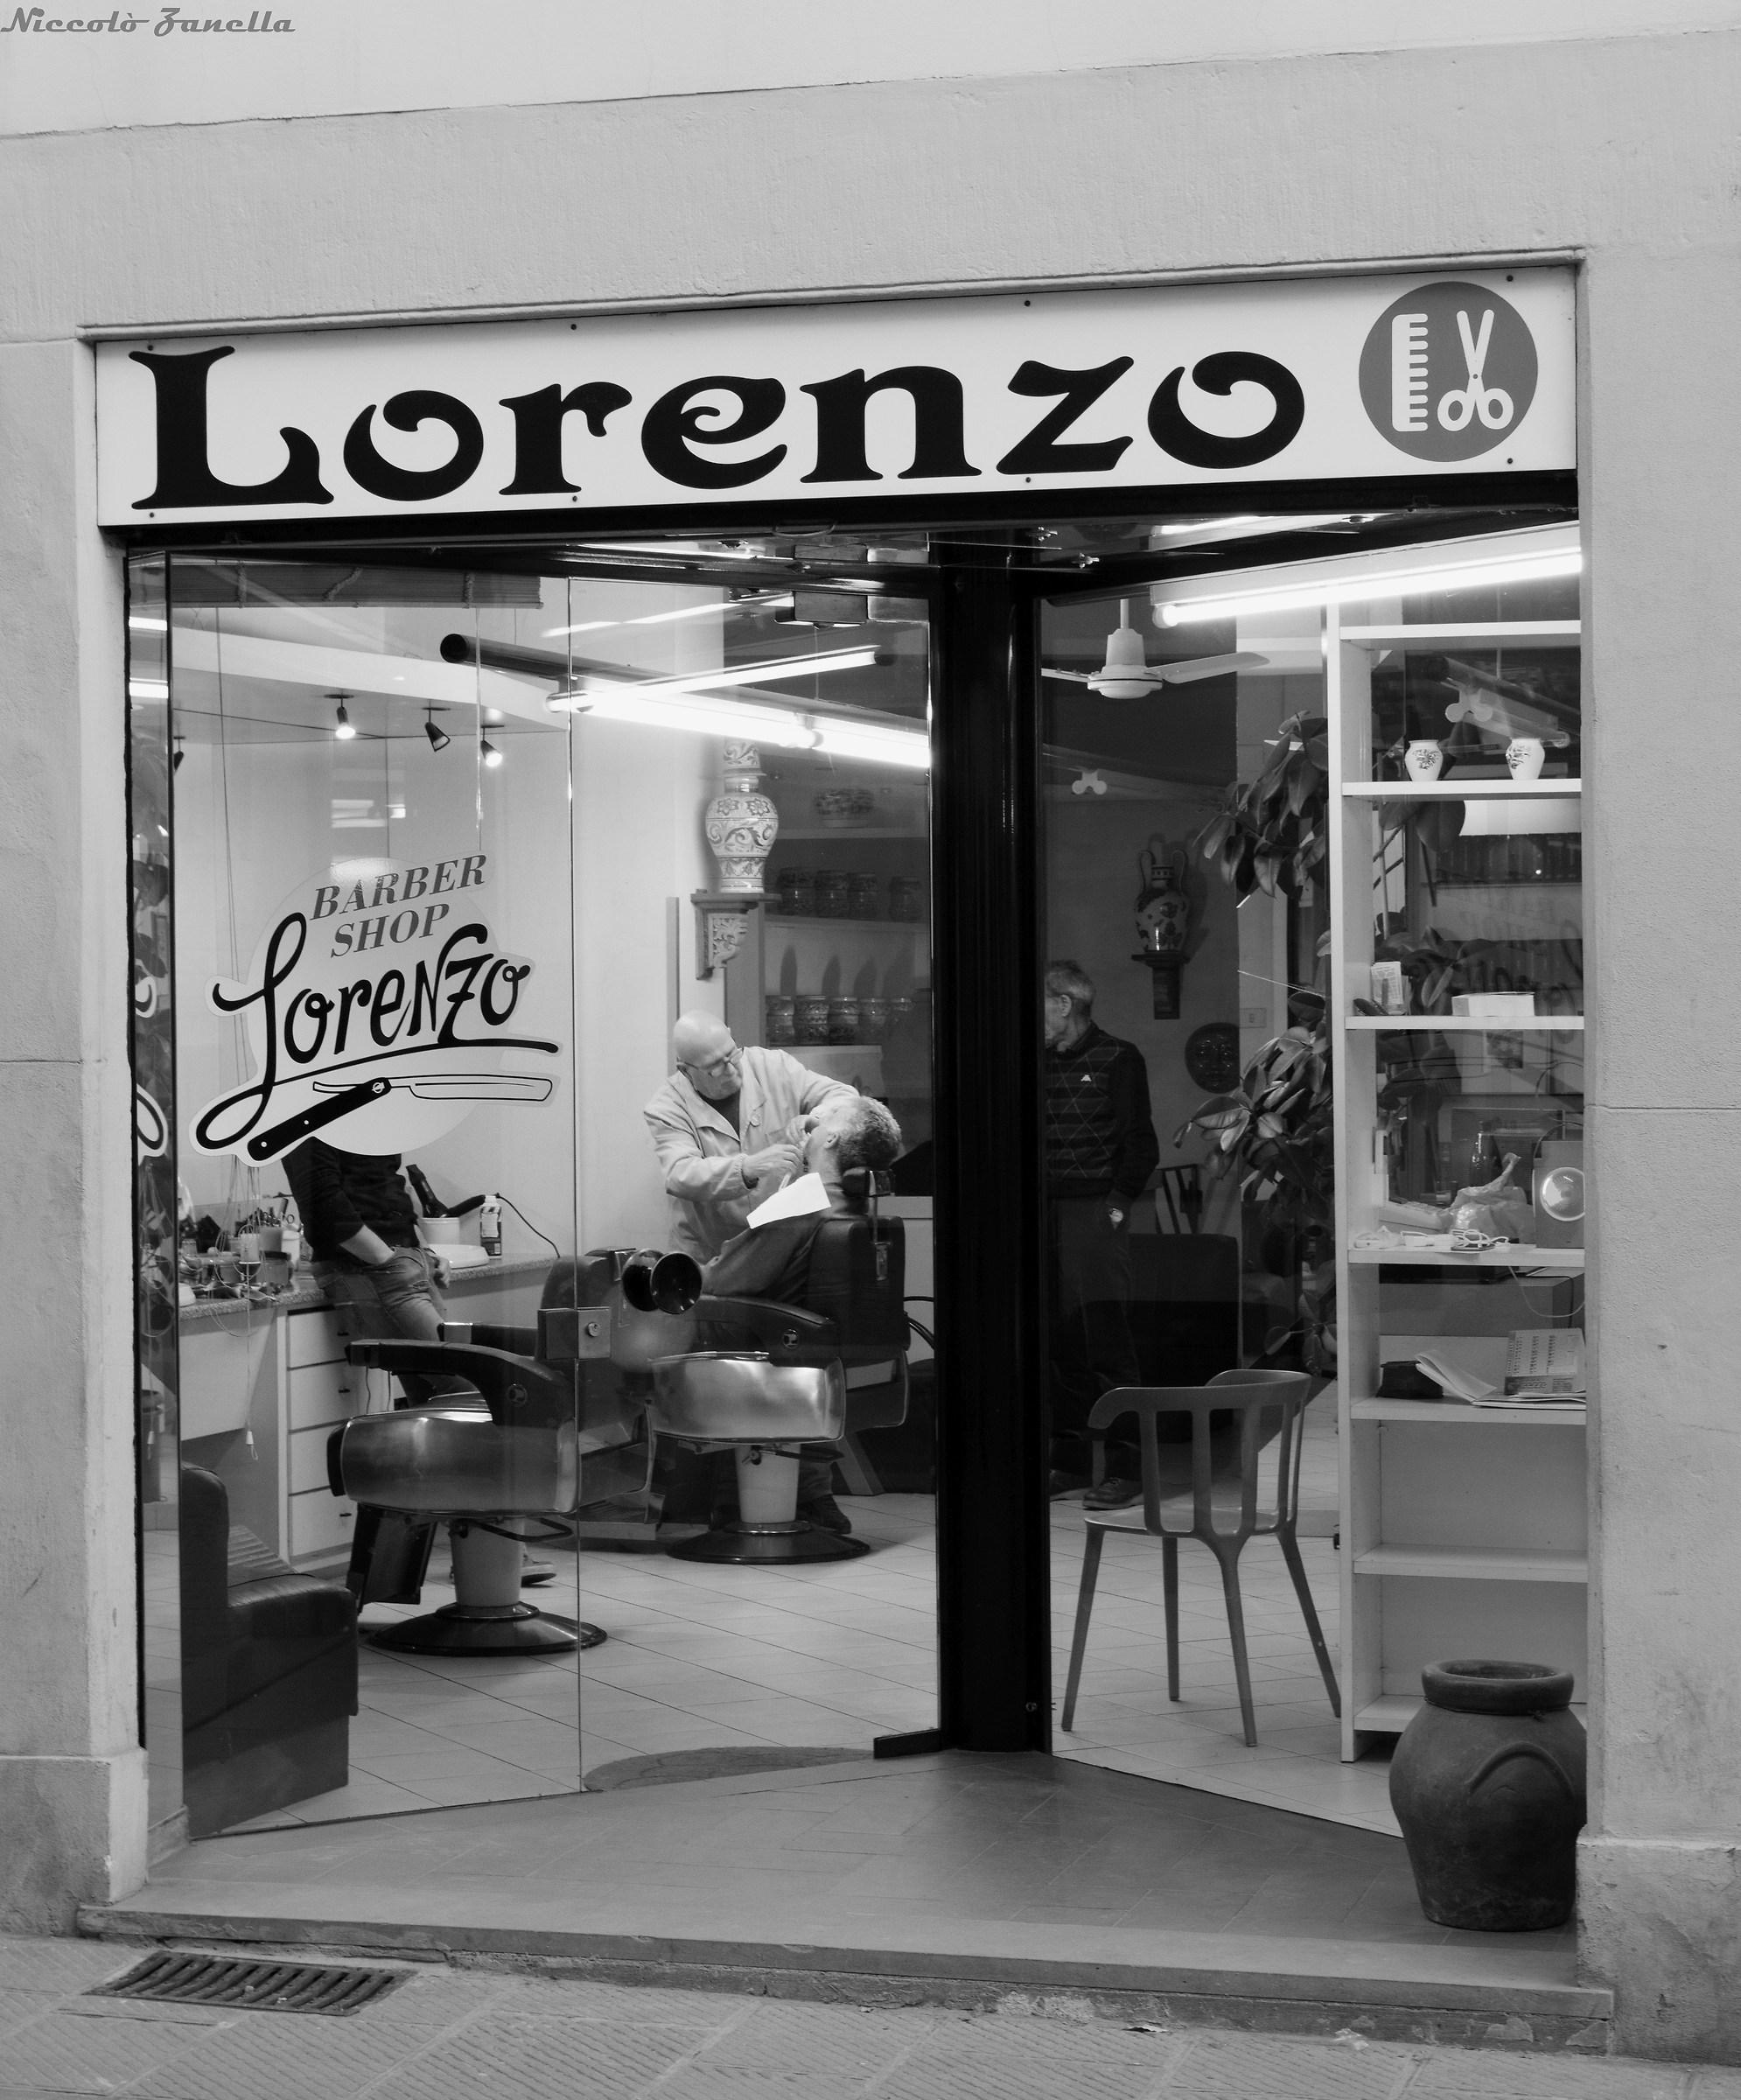 Lorenzo Barber Shop...